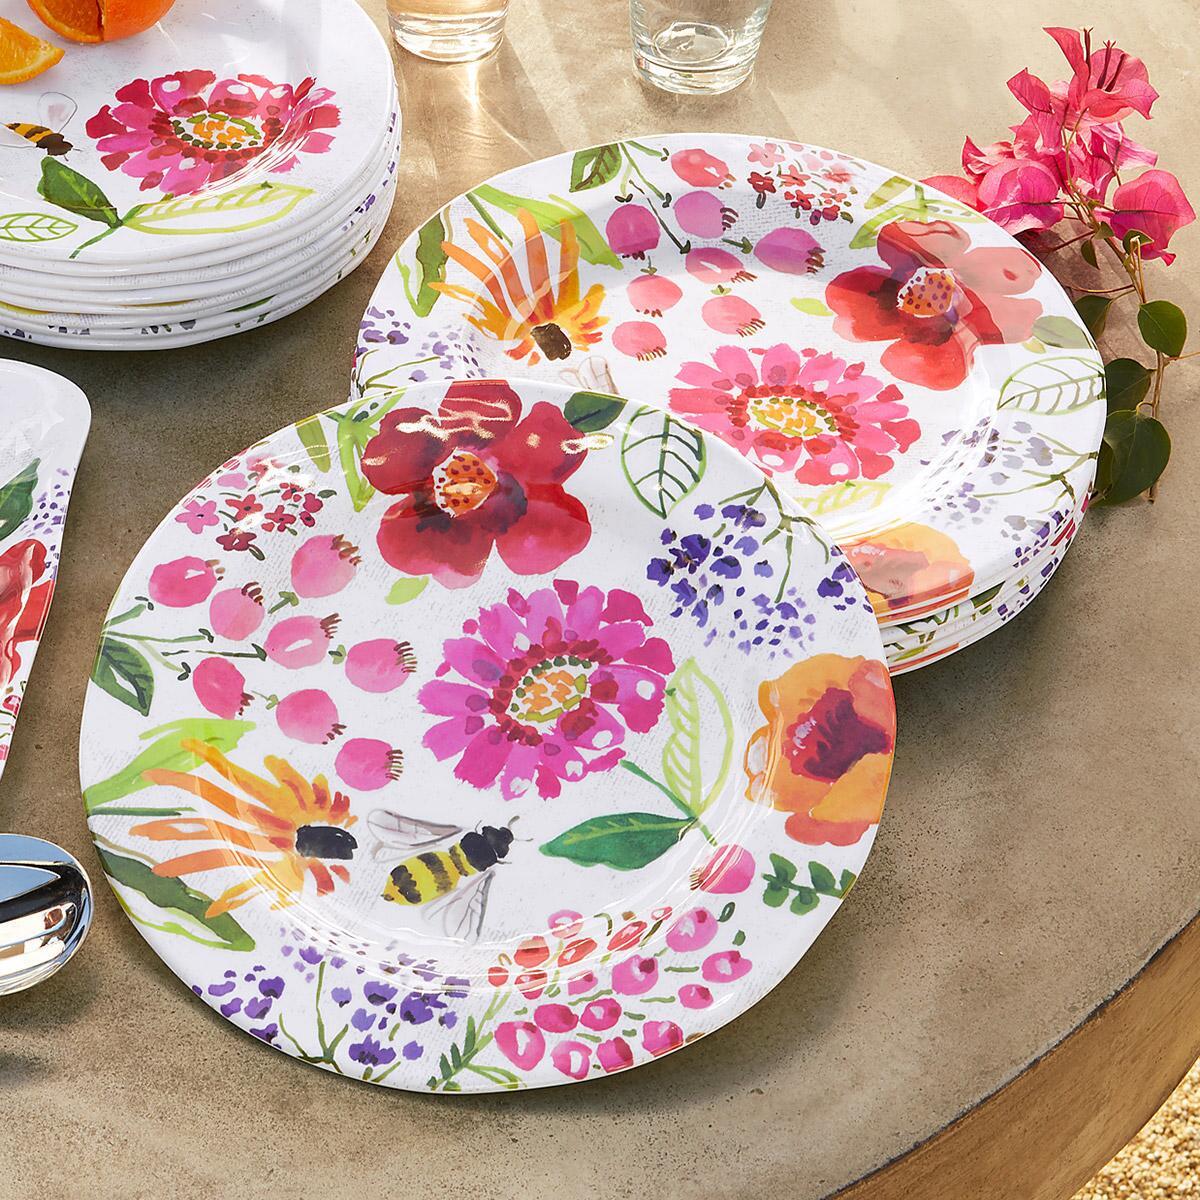 FLORAL MELAMINE DINNER PLATES, SET OF 4: View 2